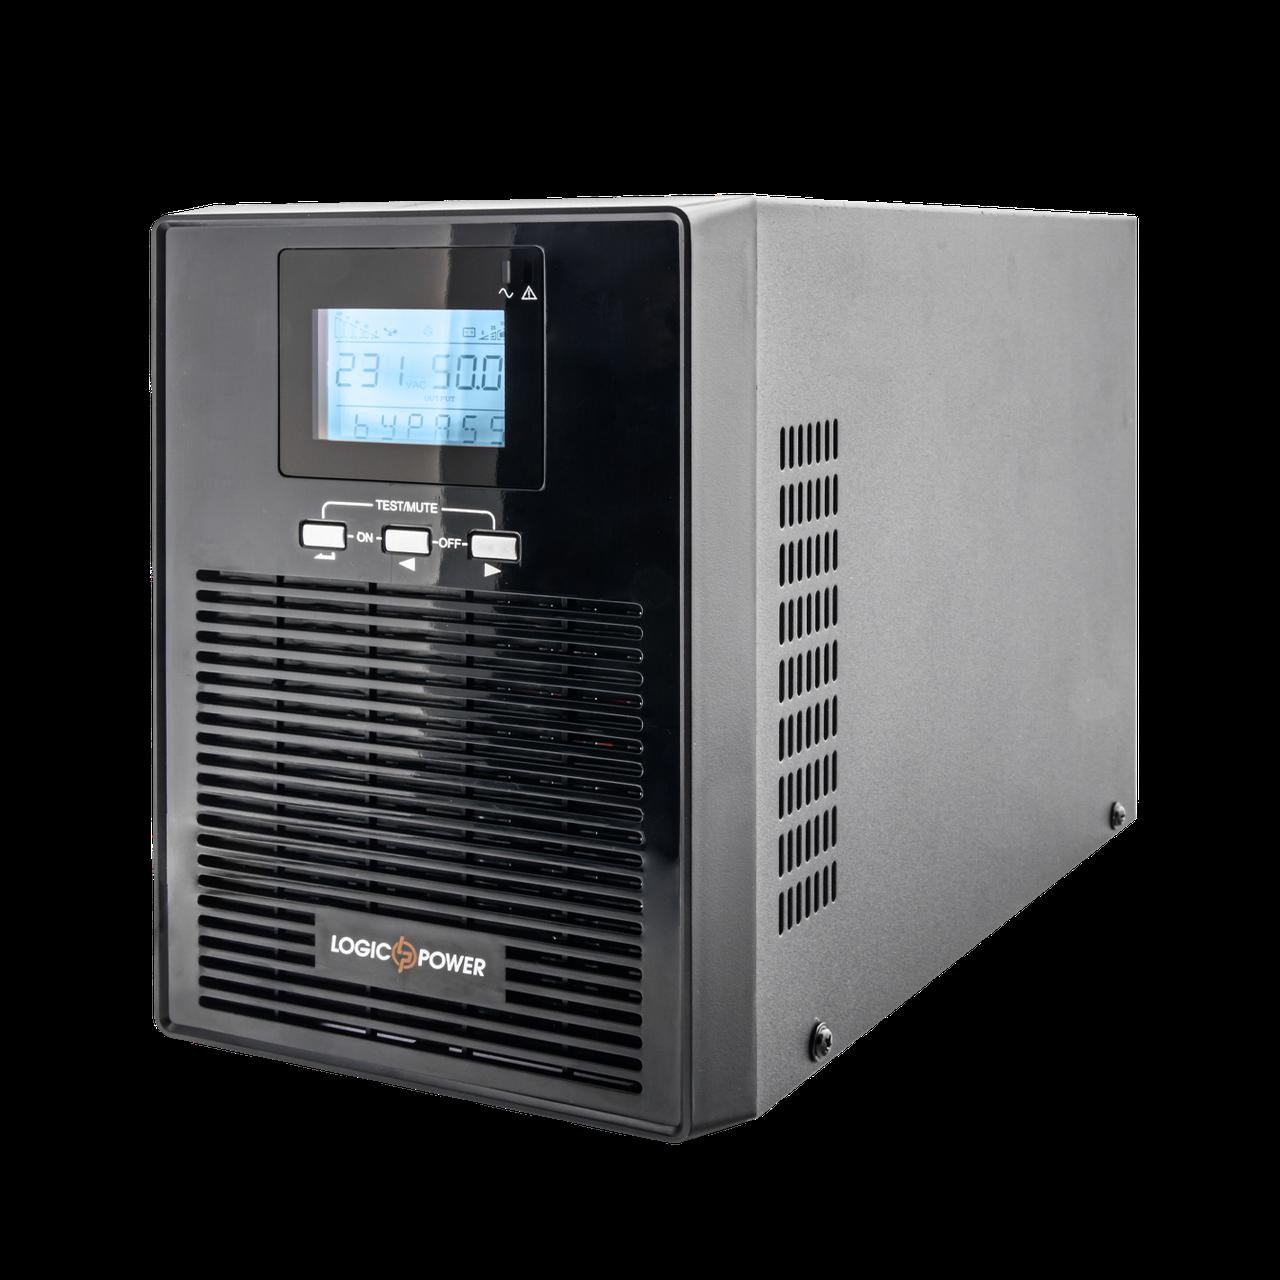 ИБП Smart-UPS LogicPower-1000 PRO